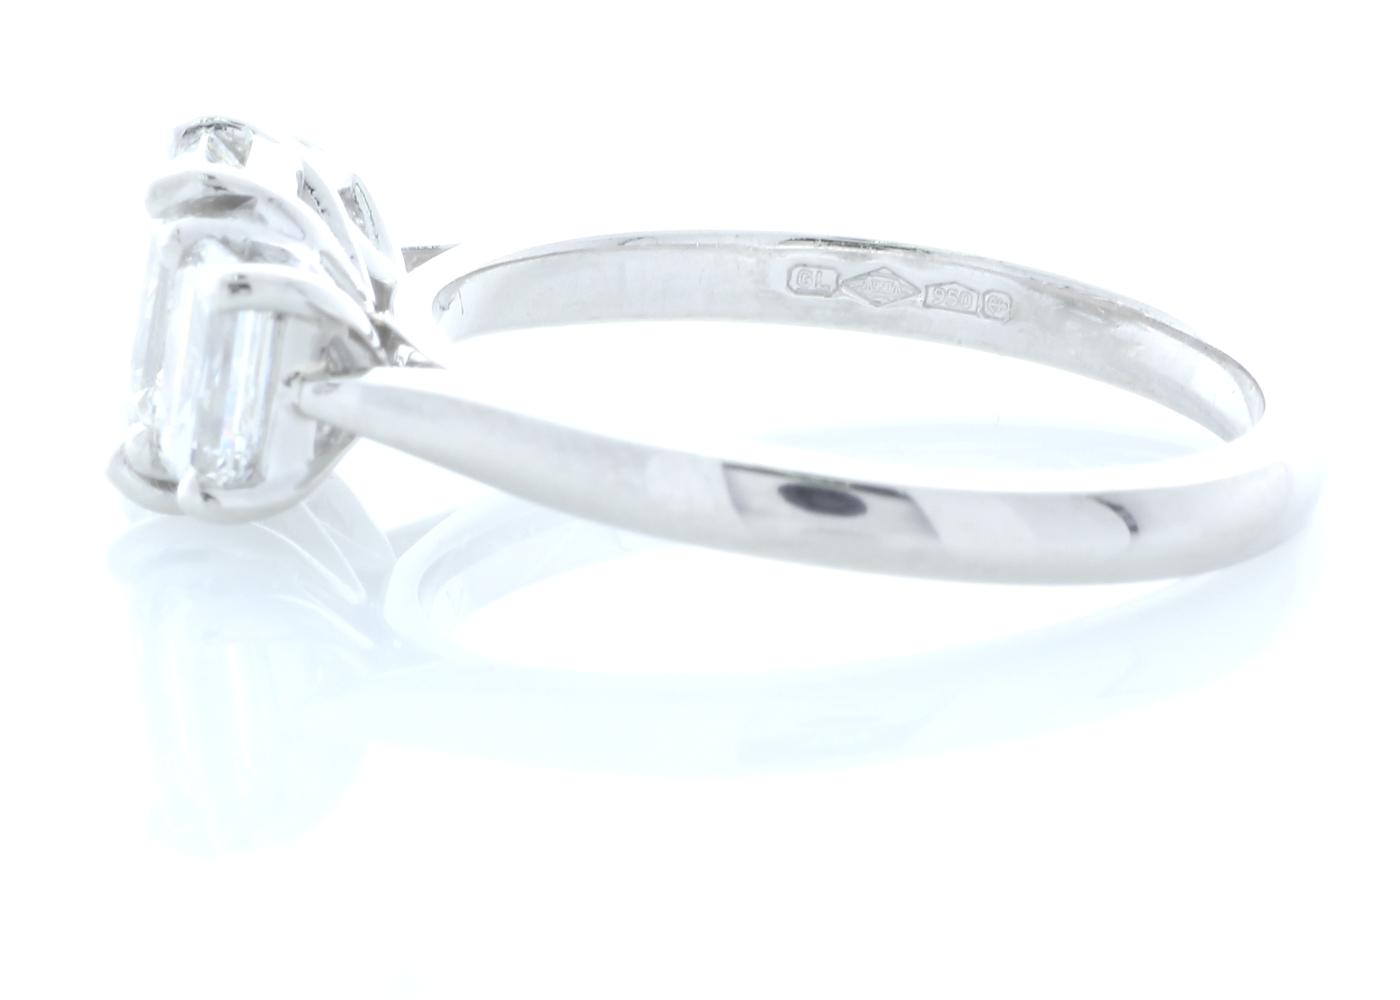 Platinum Three Stone Claw Set Diamond Ring 1.91 Carats - Image 2 of 4